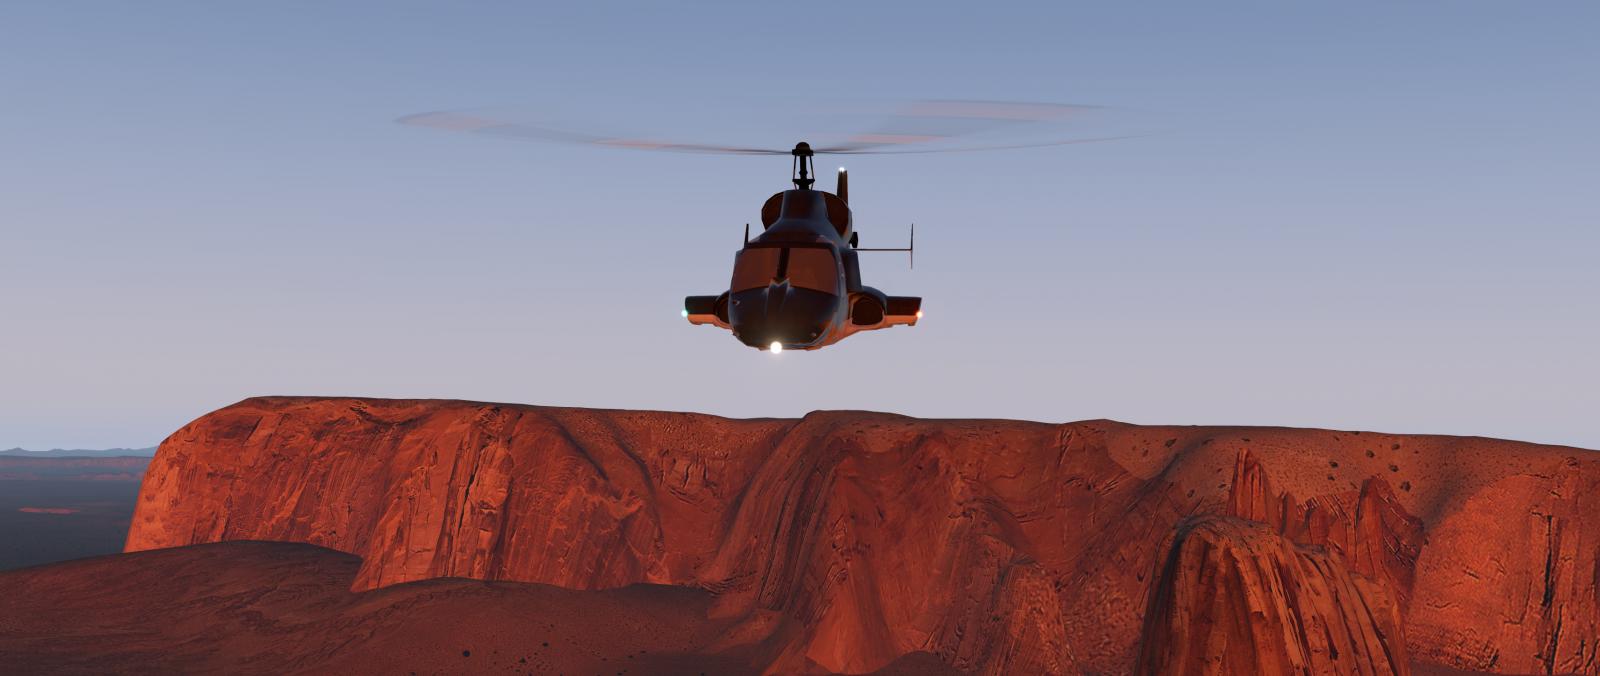 Airwolf For X-Plane 11